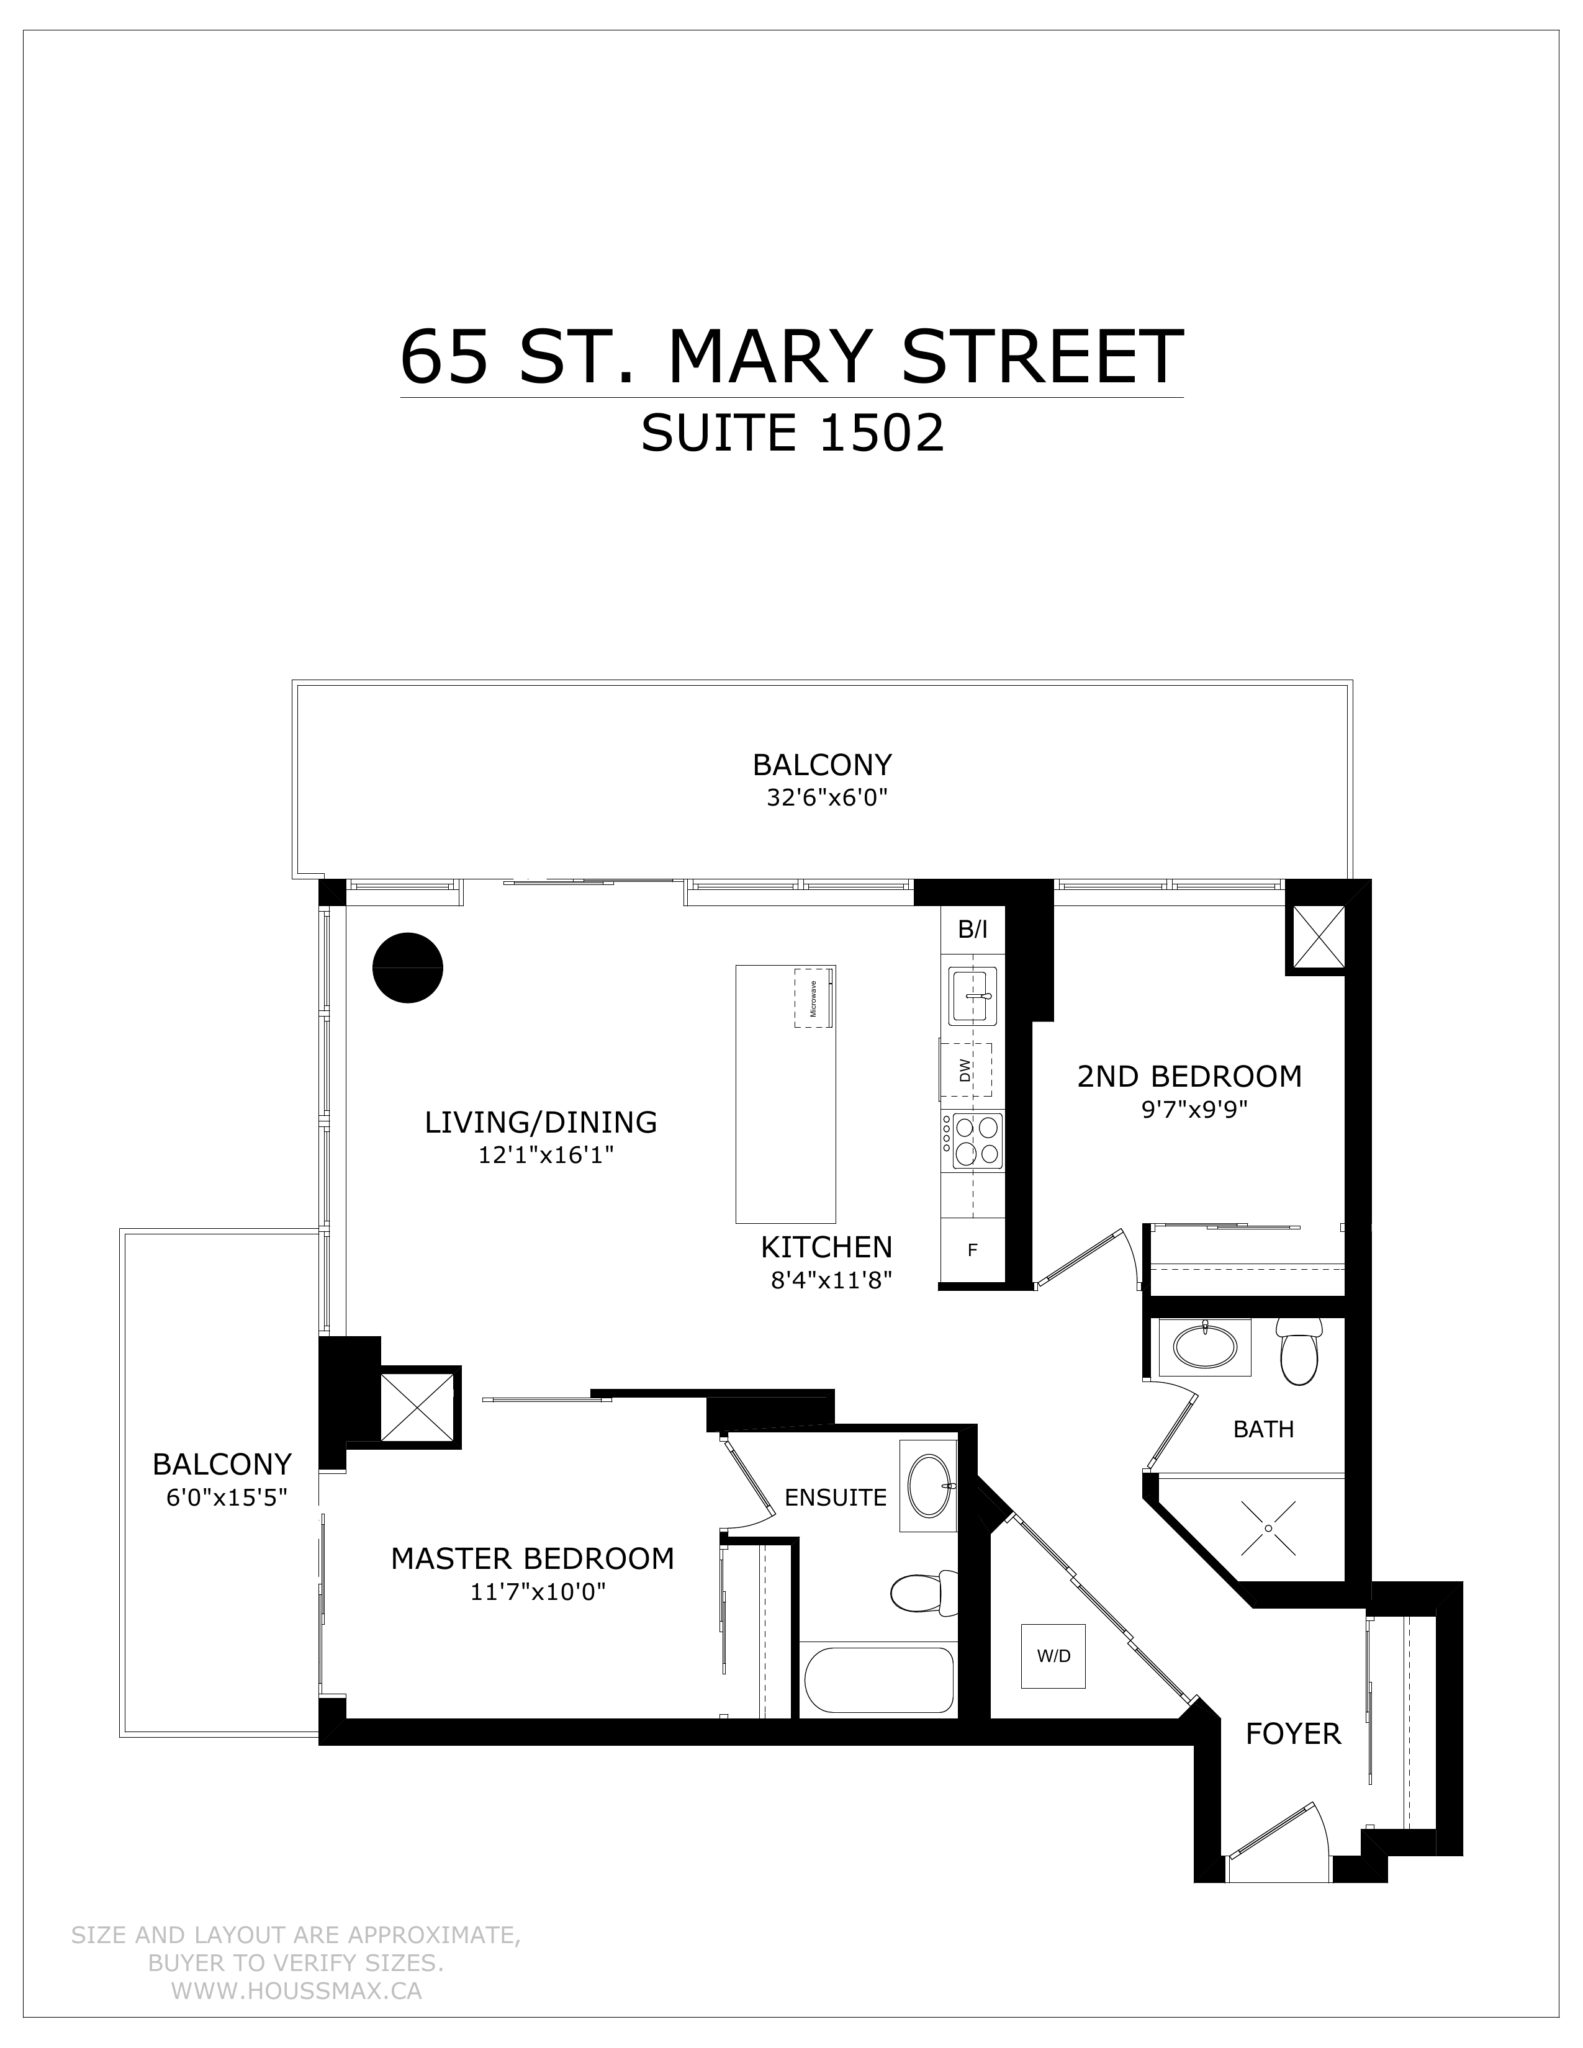 Floor Plans for 65 St Mary Street Unit 1502